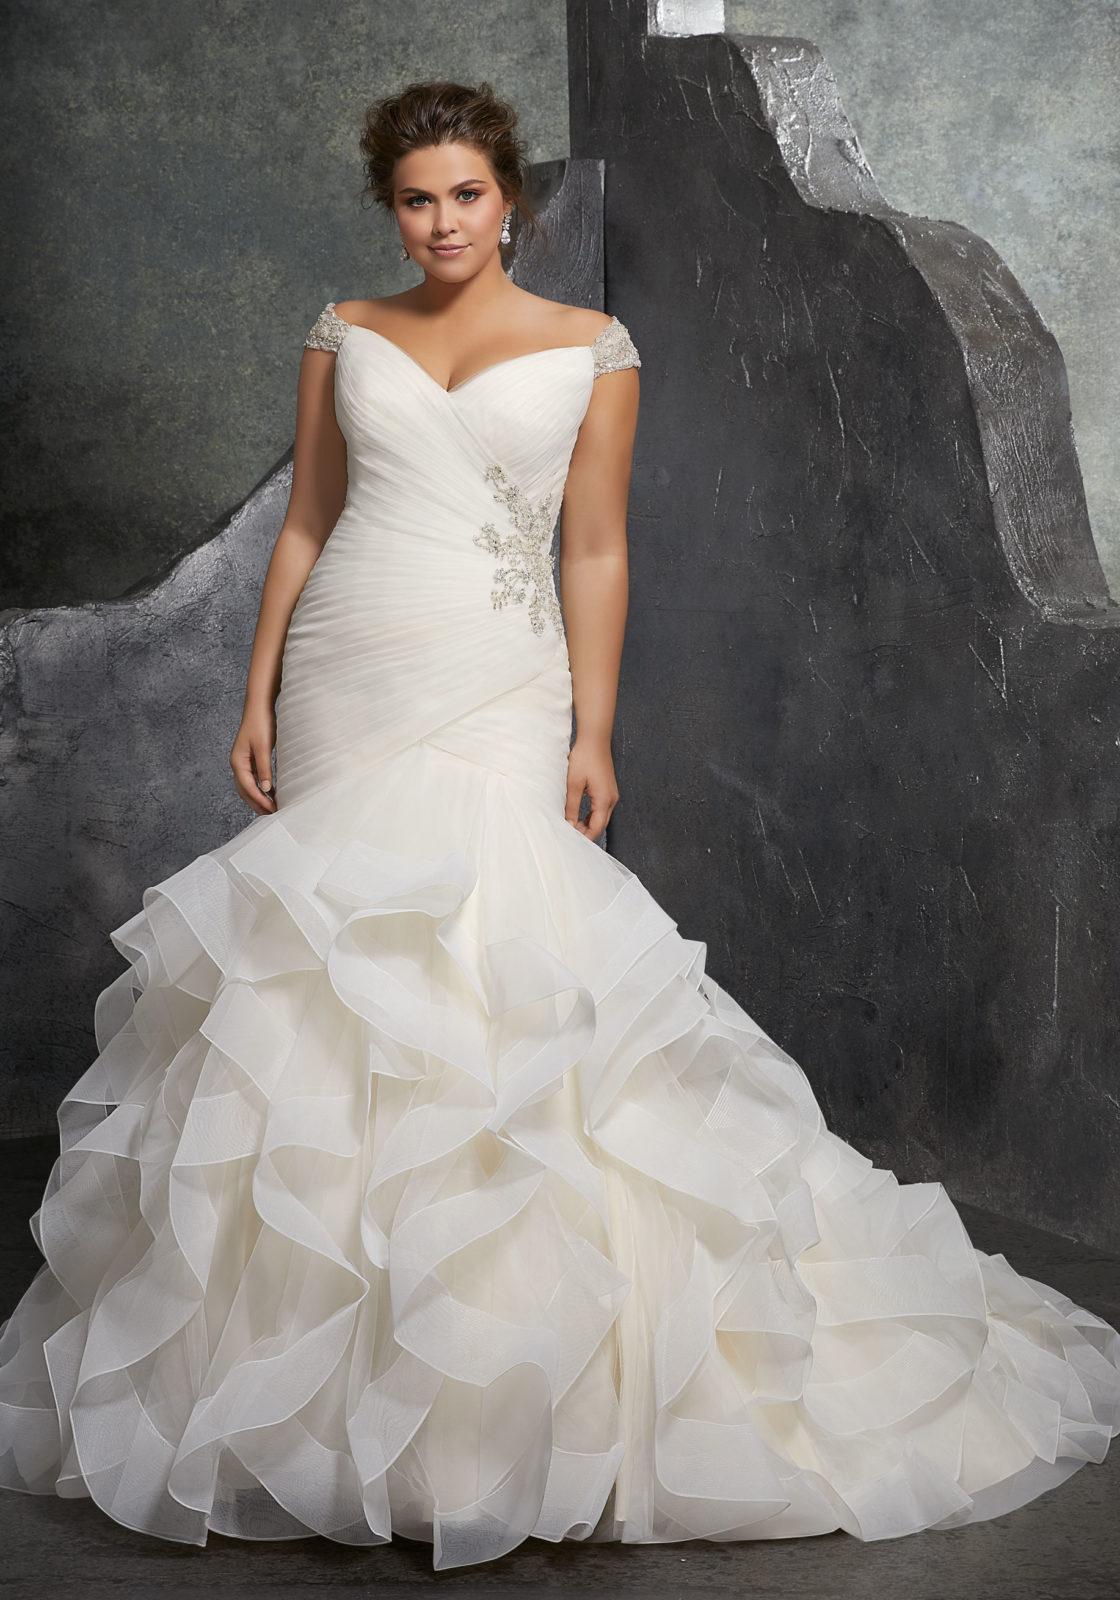 wedding dresses for plus size bridal photo - 1